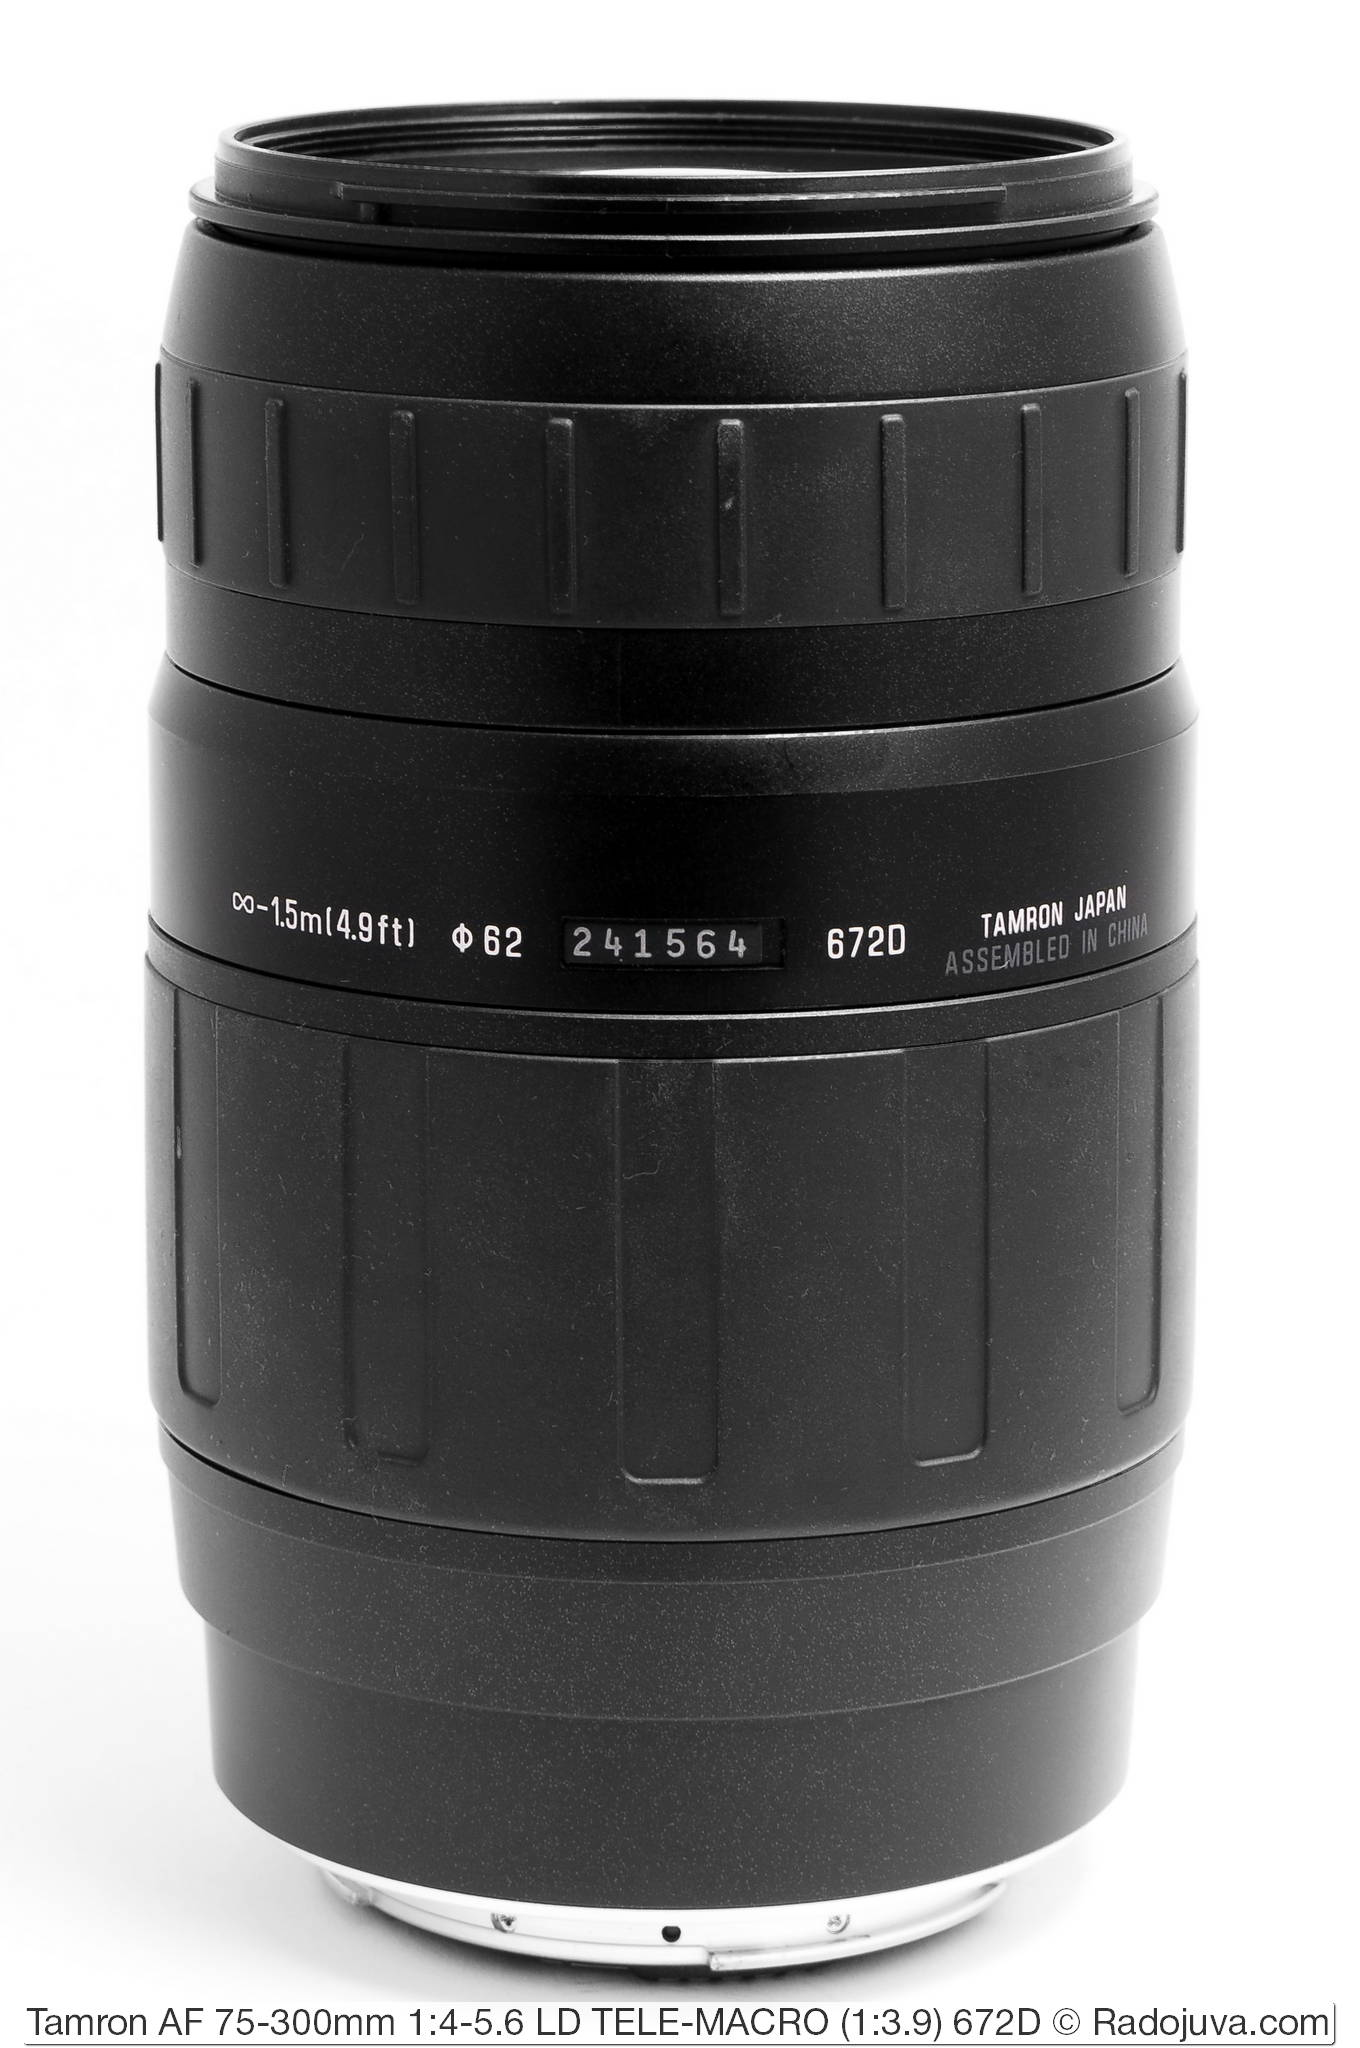 Tamron AF 75-300mm 1:4-5.6 LD TELE-MACRO (1:3.9) 672D